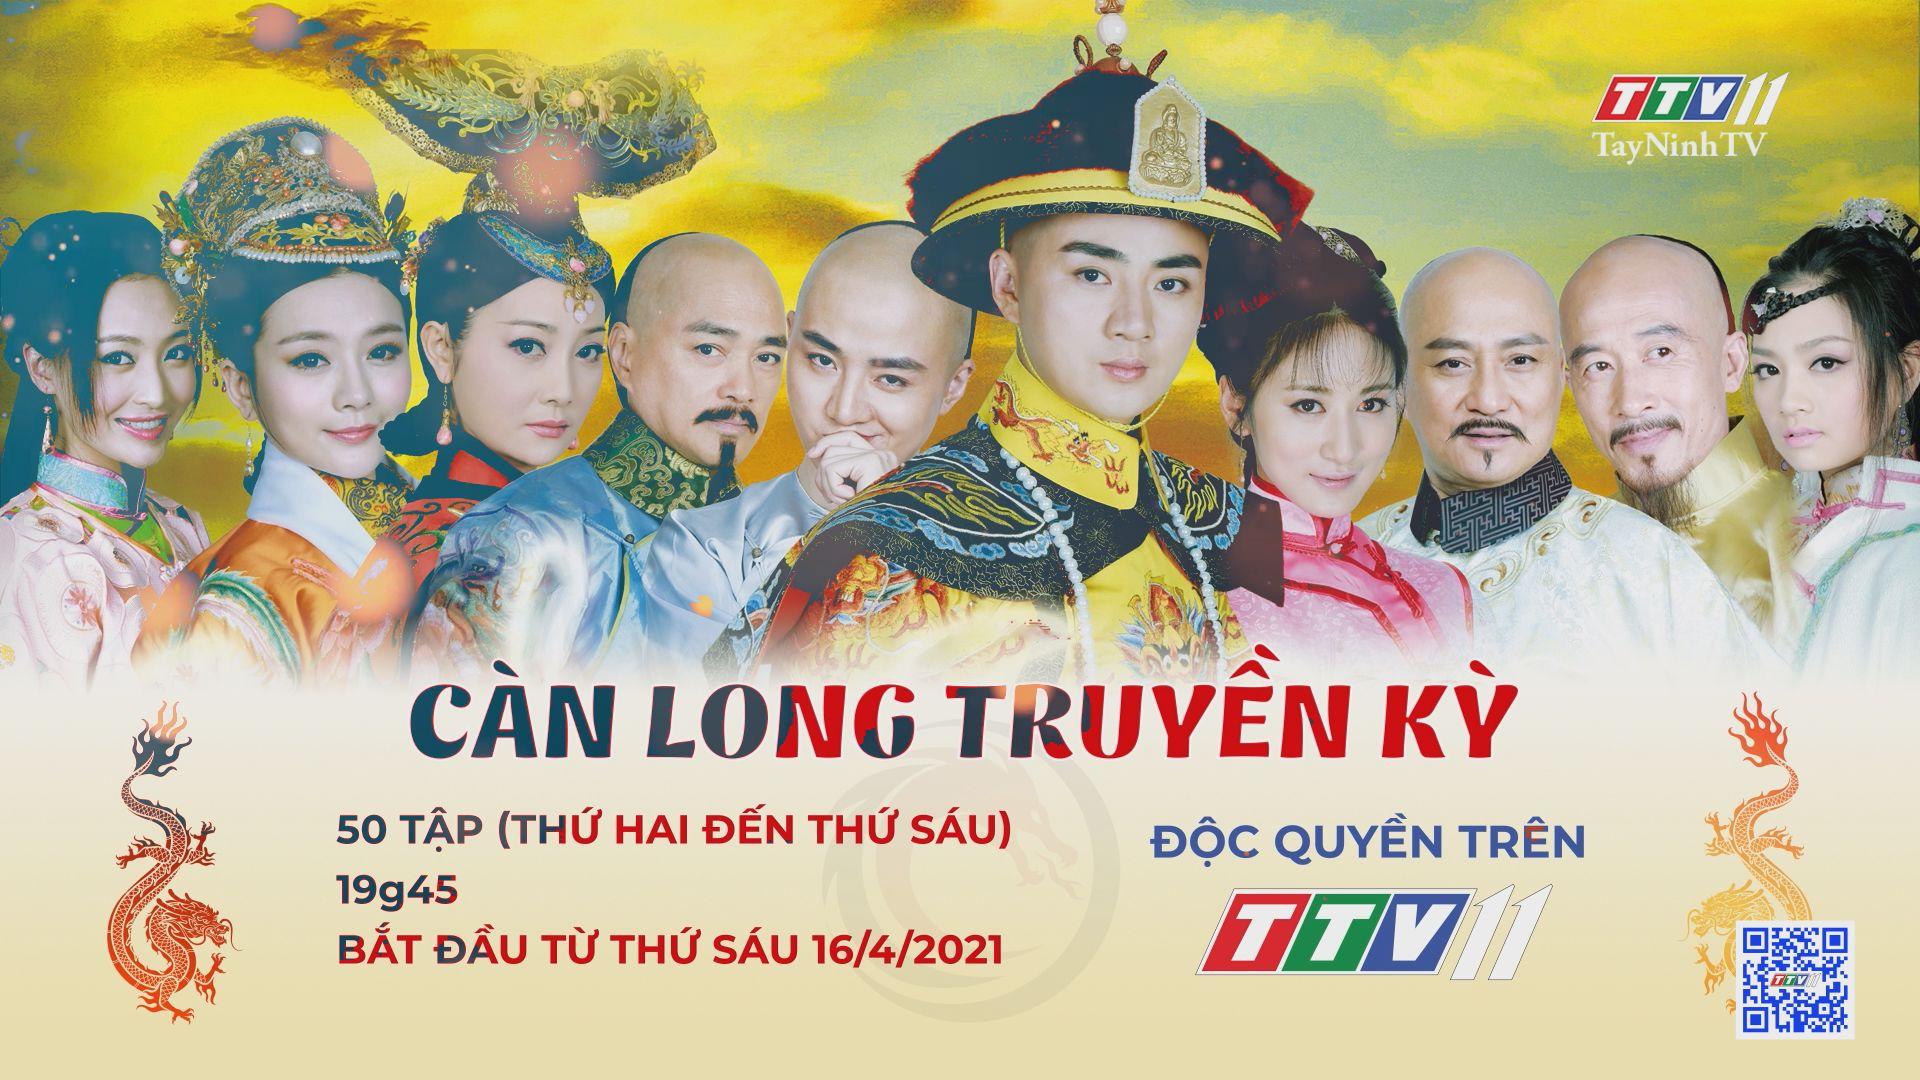 Phim Càn Long truyền kỳ-Trailer | TayNinhTVE